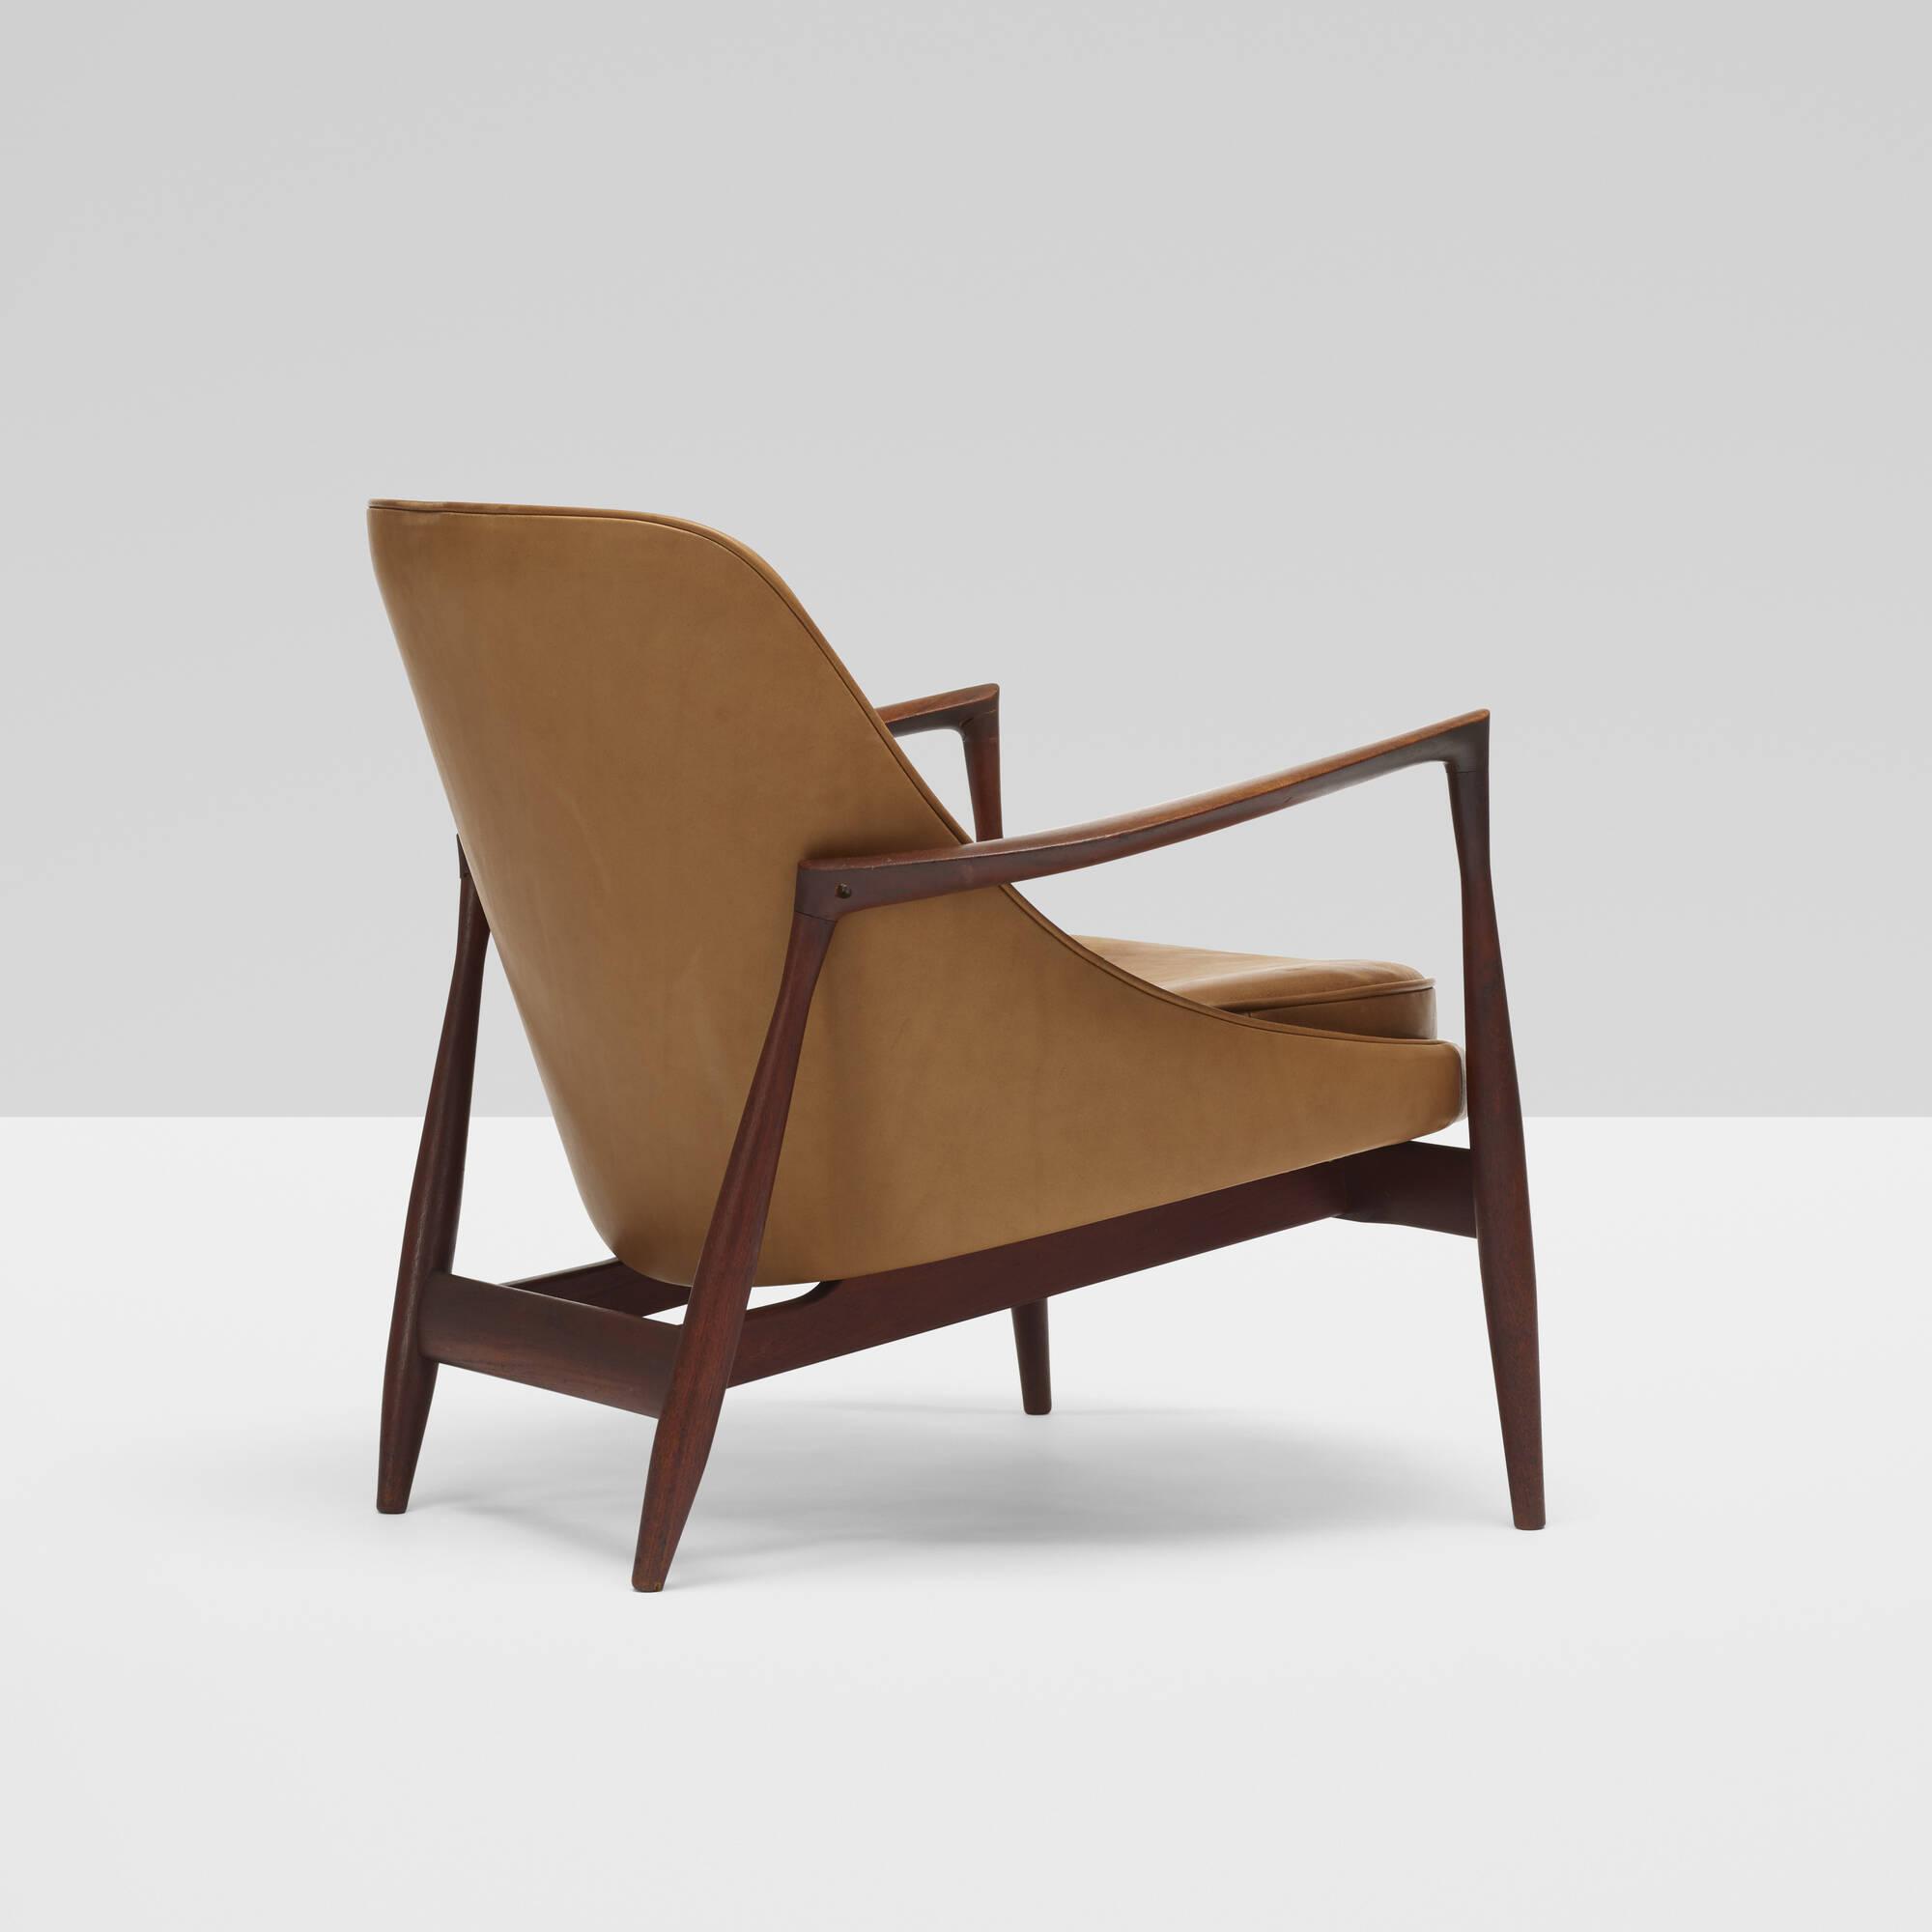 372: Ib Kofod-Larsen / Elizabeth chair (1 of 3)